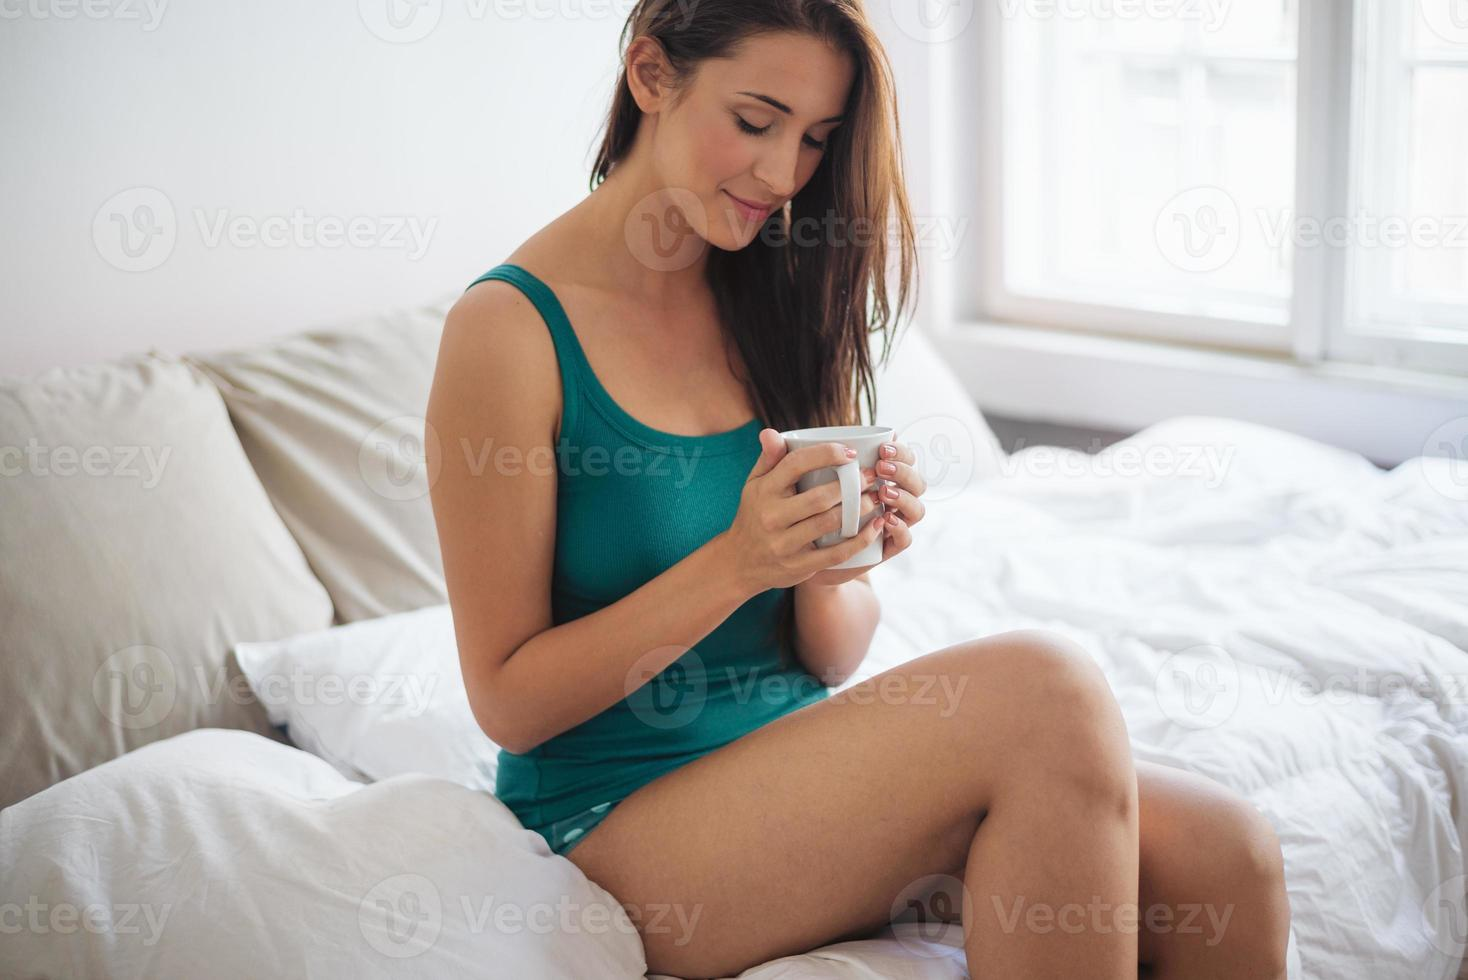 koffie drinken in bed foto